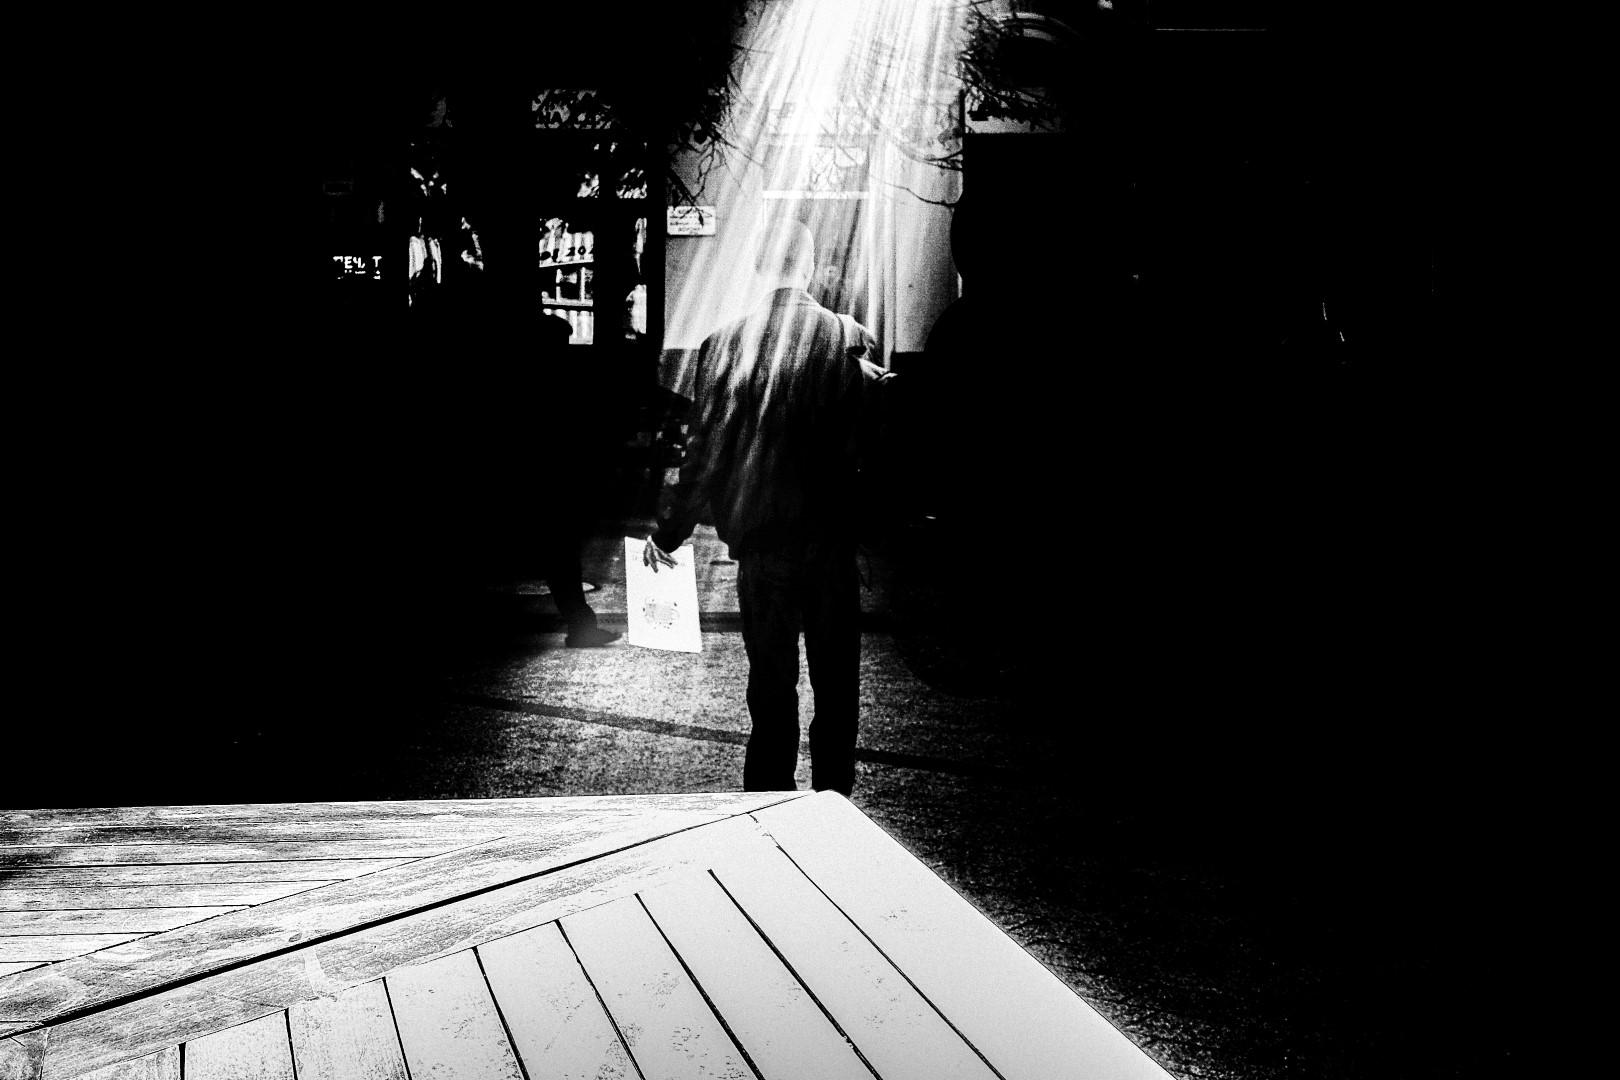 ray-of-light_23411484991_o (Large).jpg